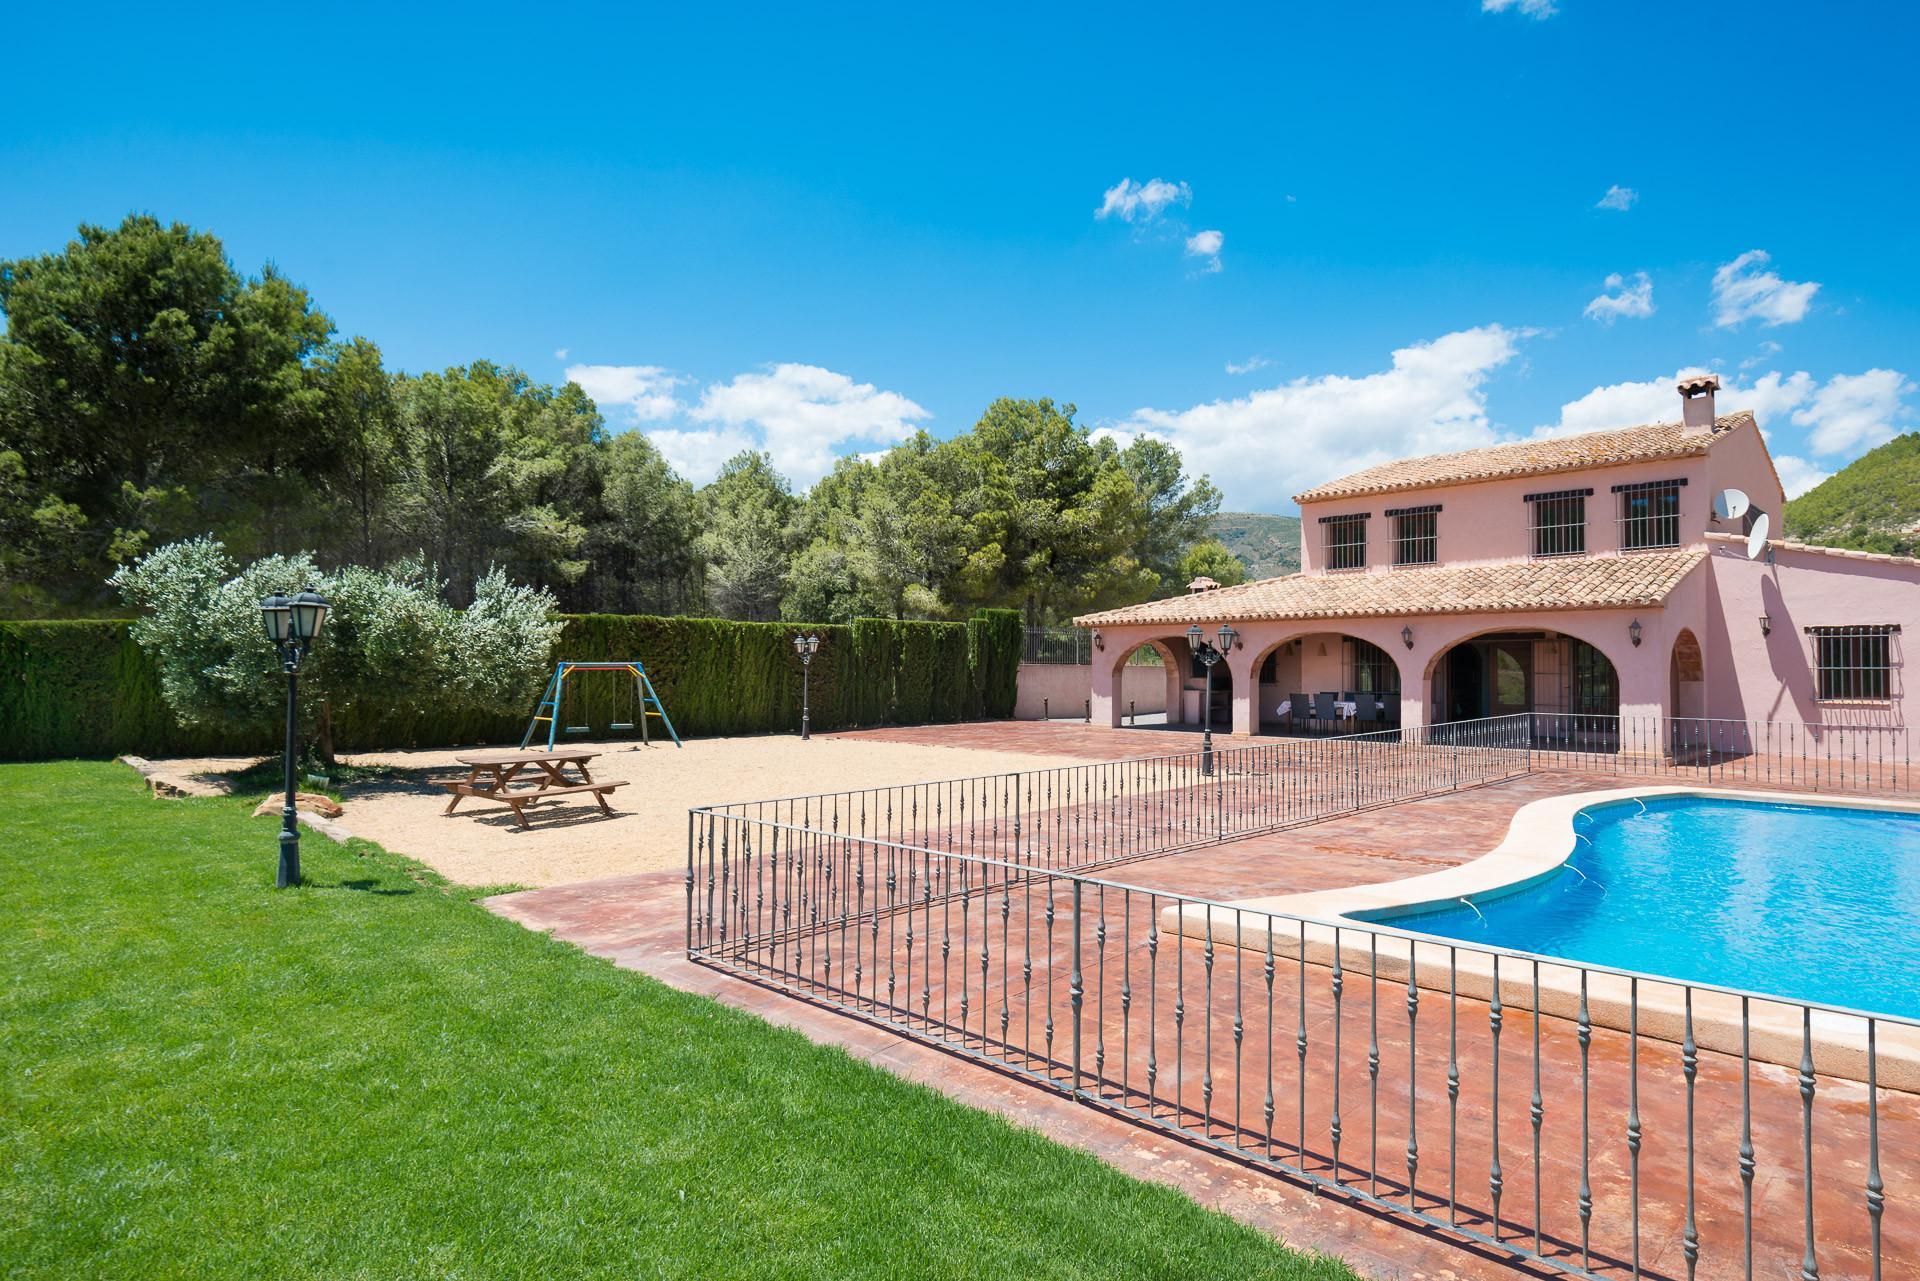 Villa Vinyent,Calpe,Costa Blanca #2